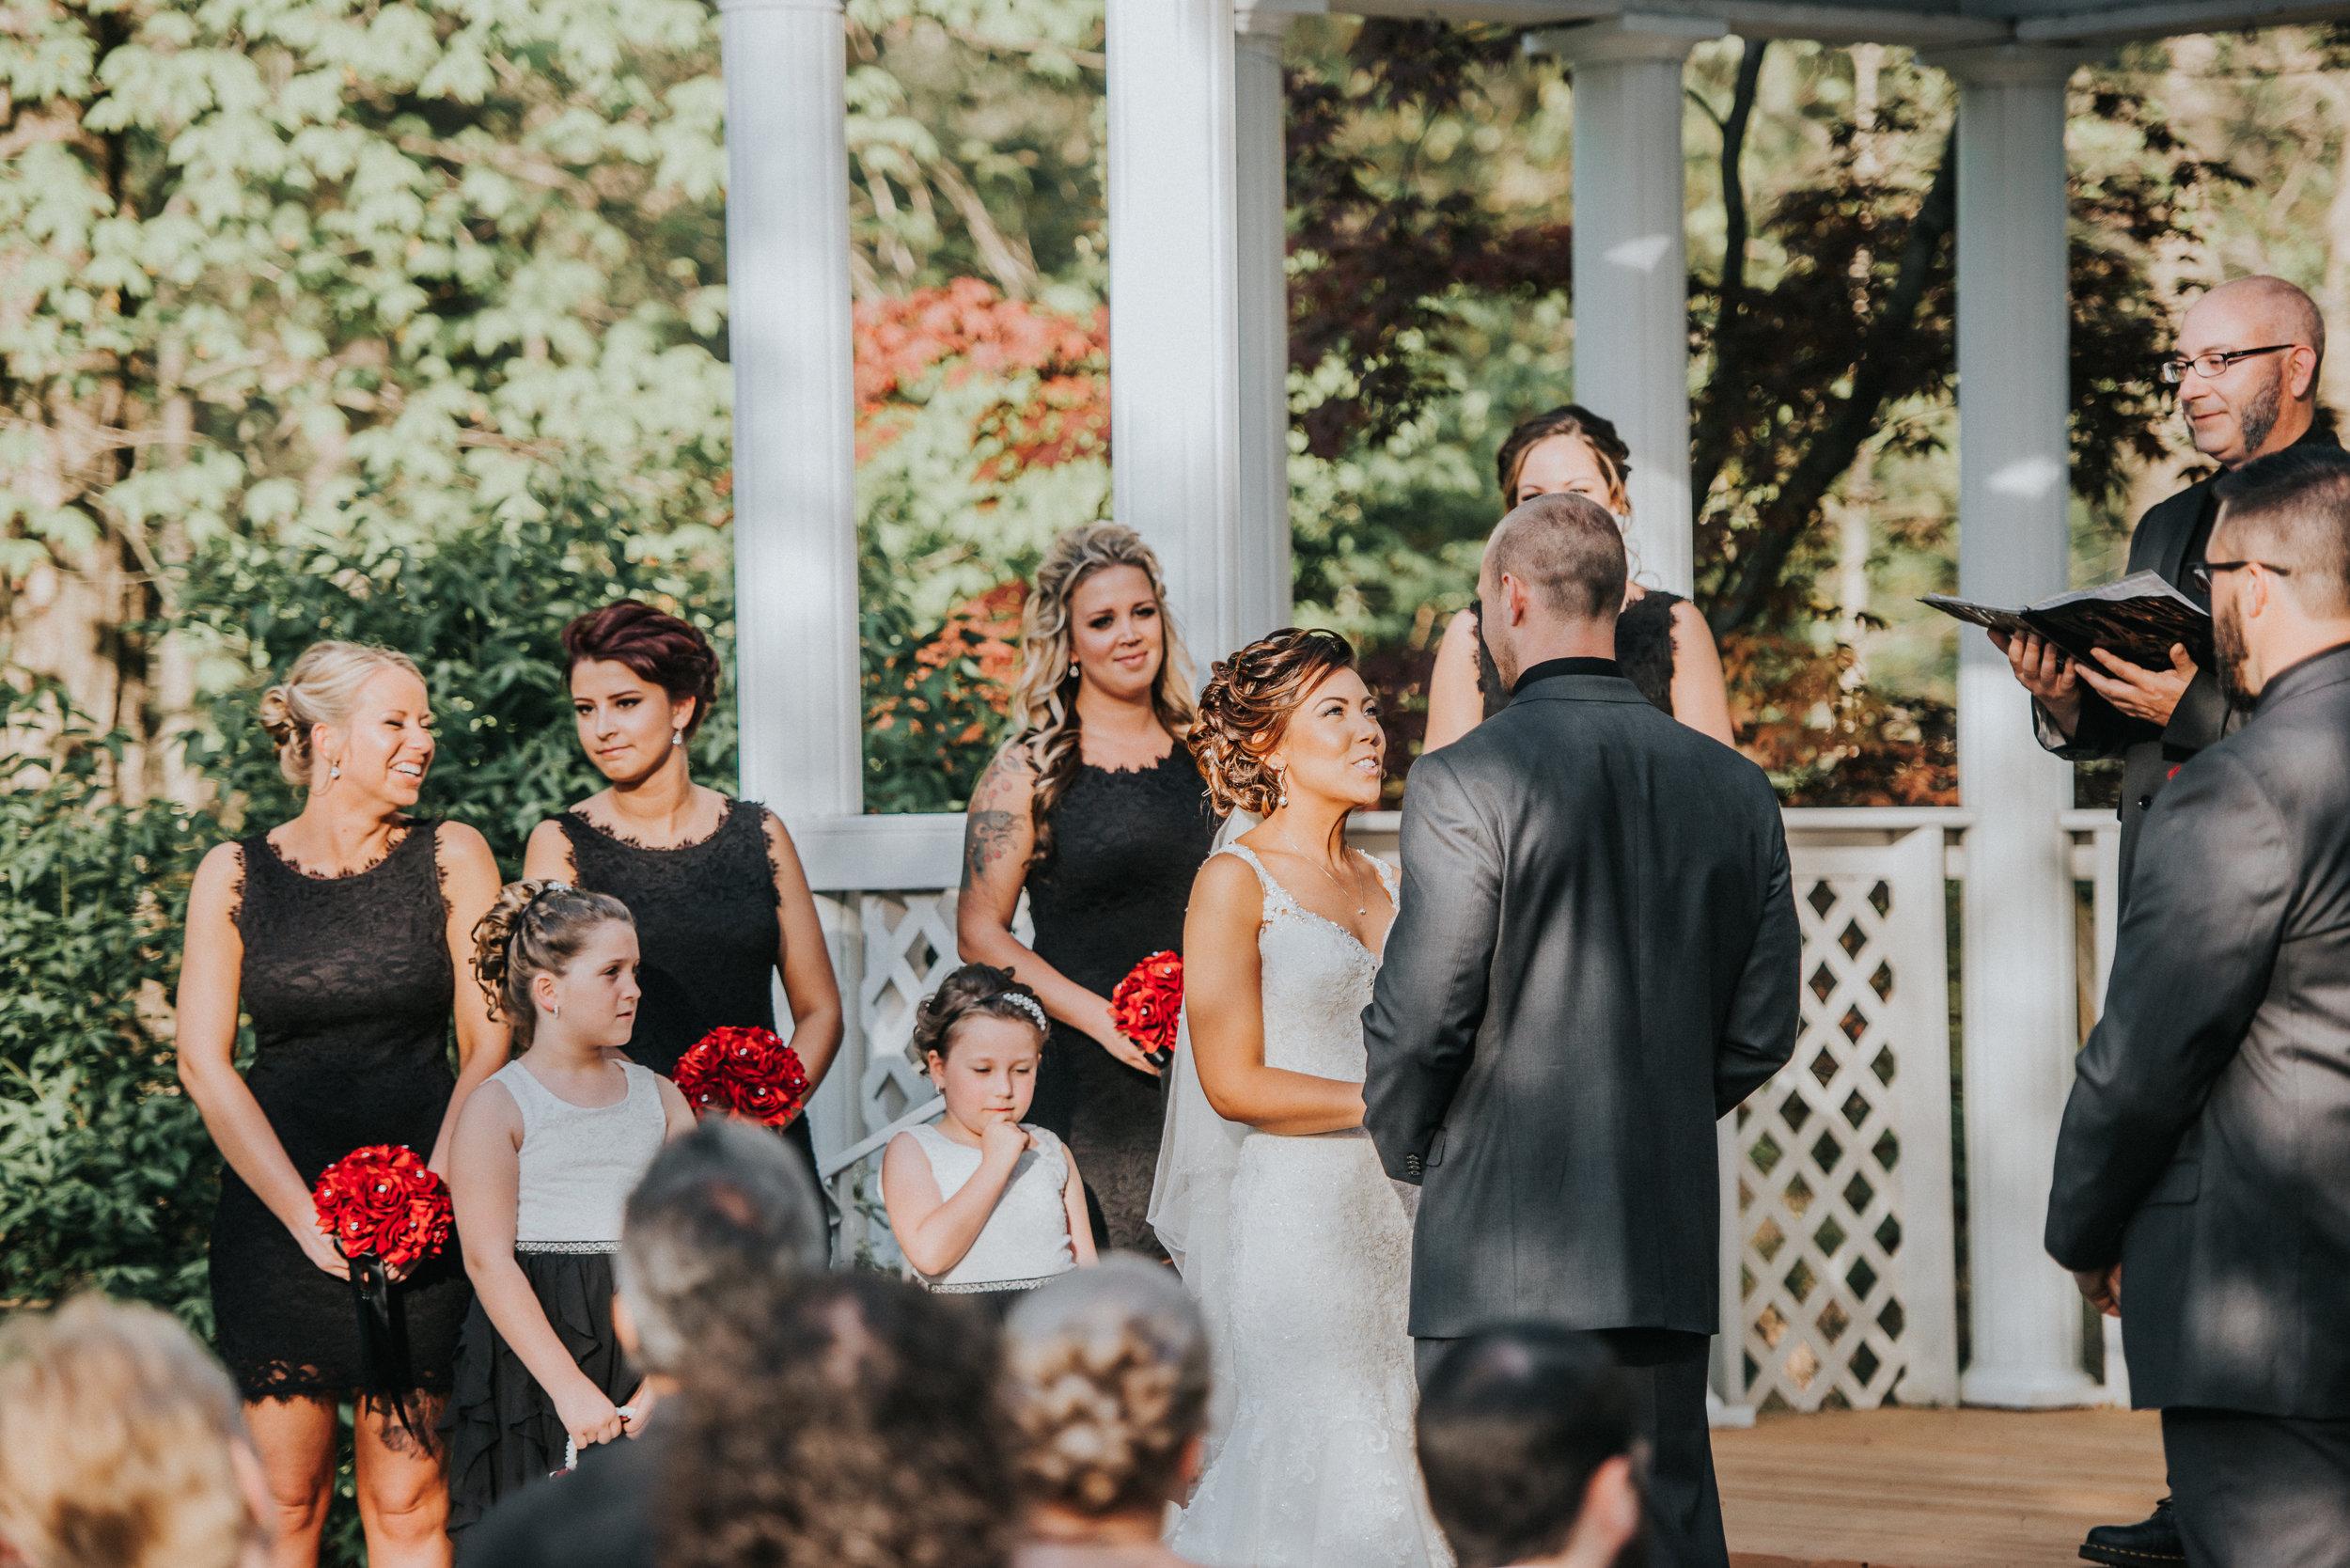 Christina-and-Gene-Wedding-Marla-Rain-Photography-327.jpg